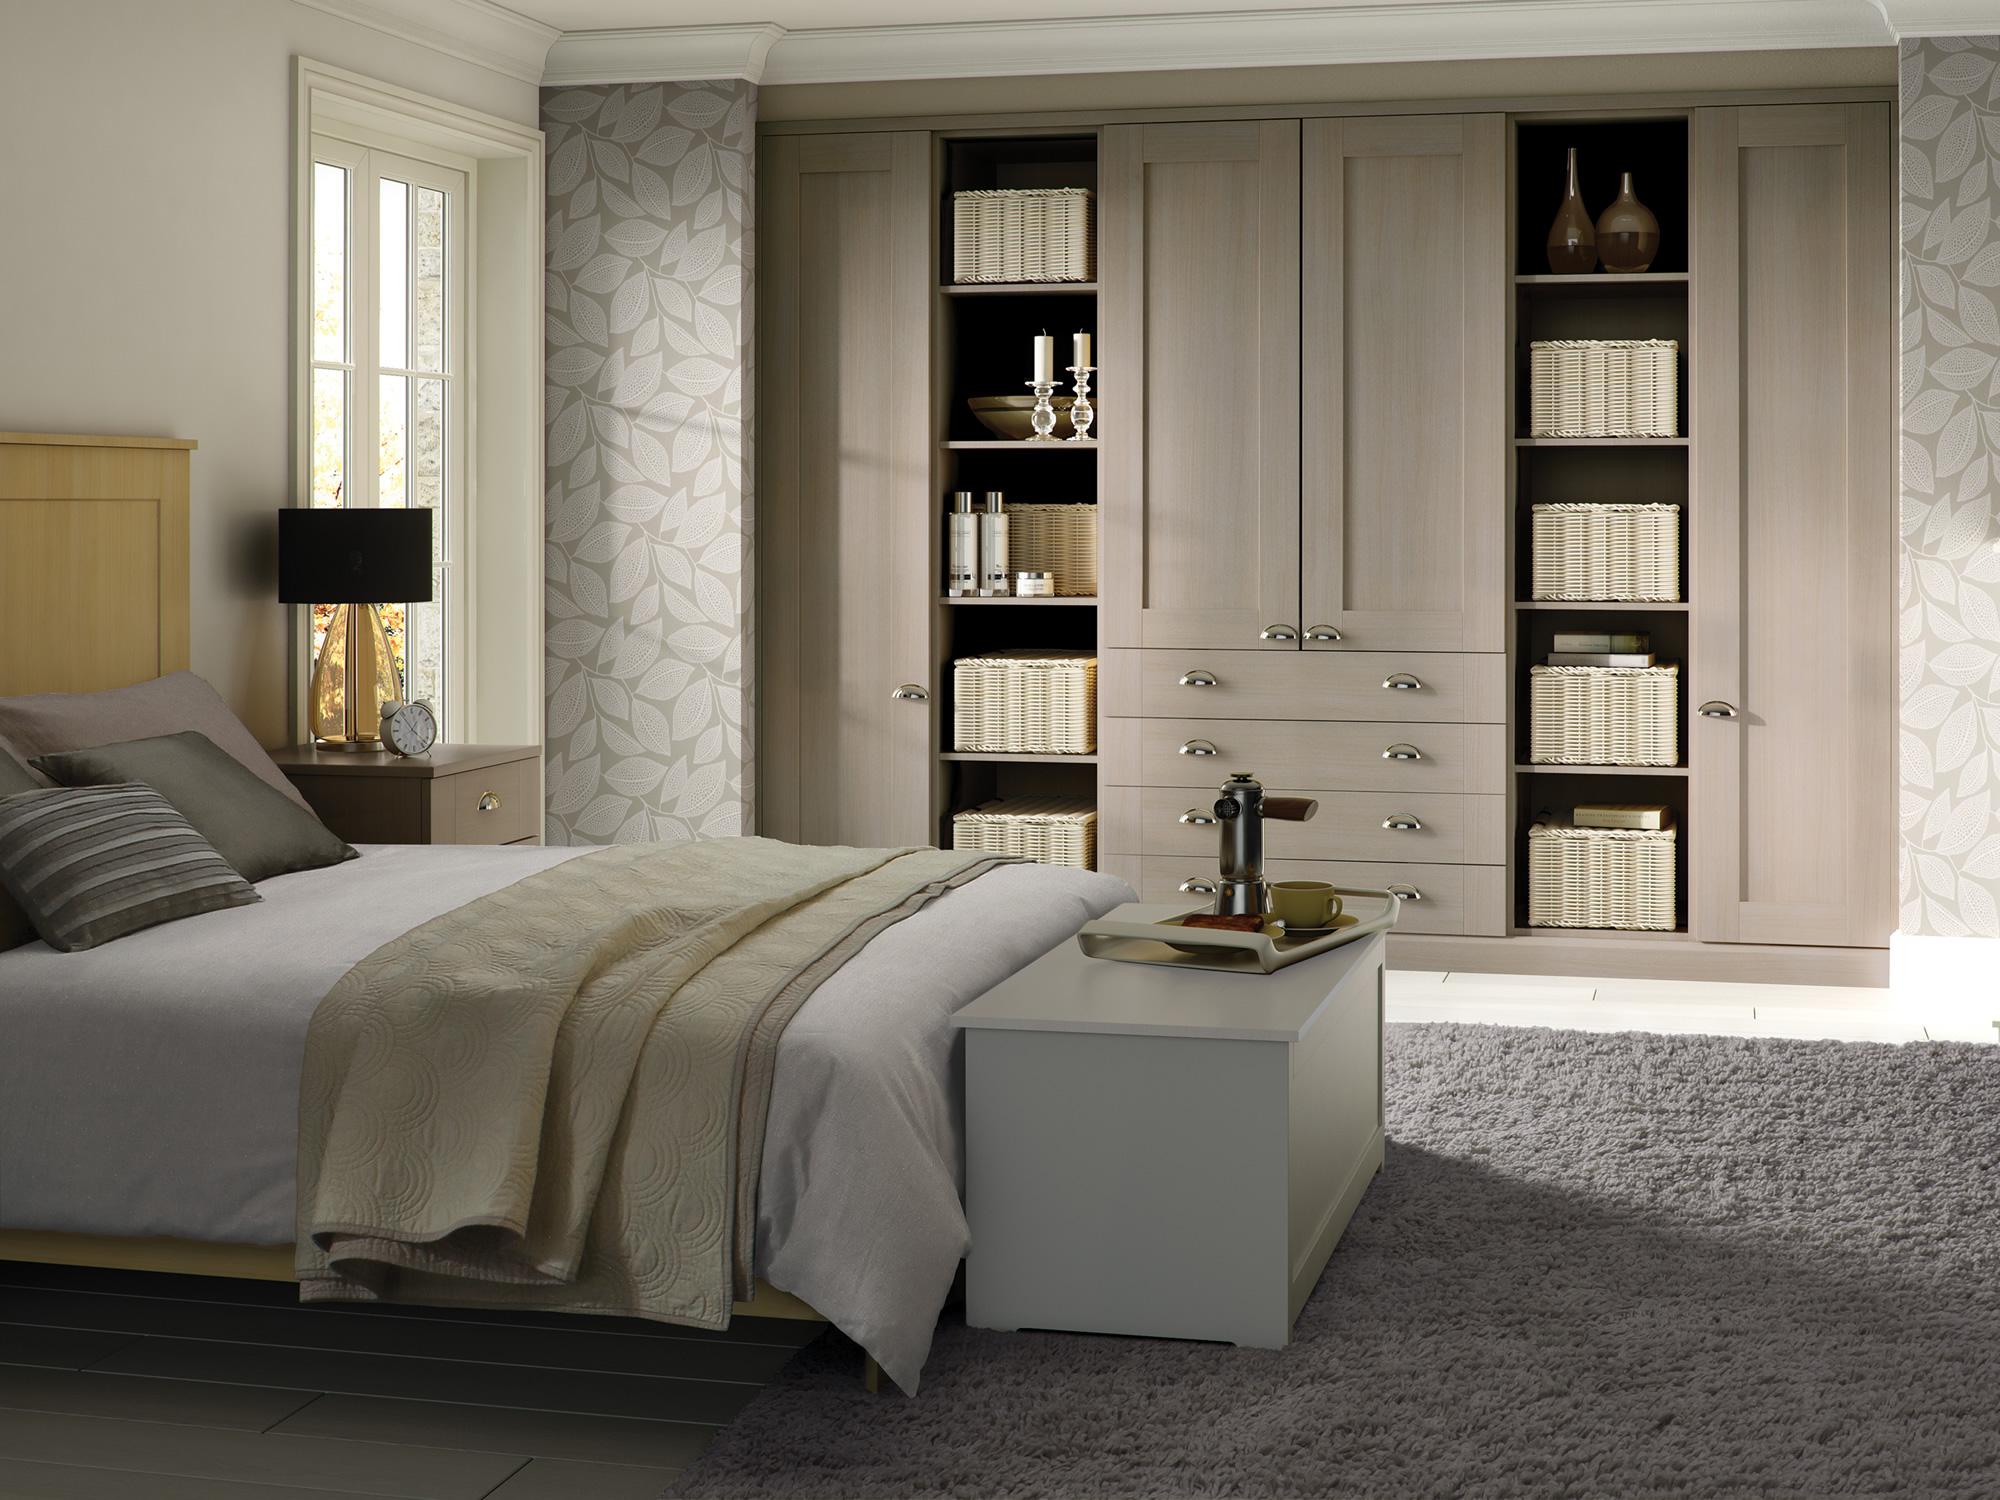 Pendle Jute Bedroom